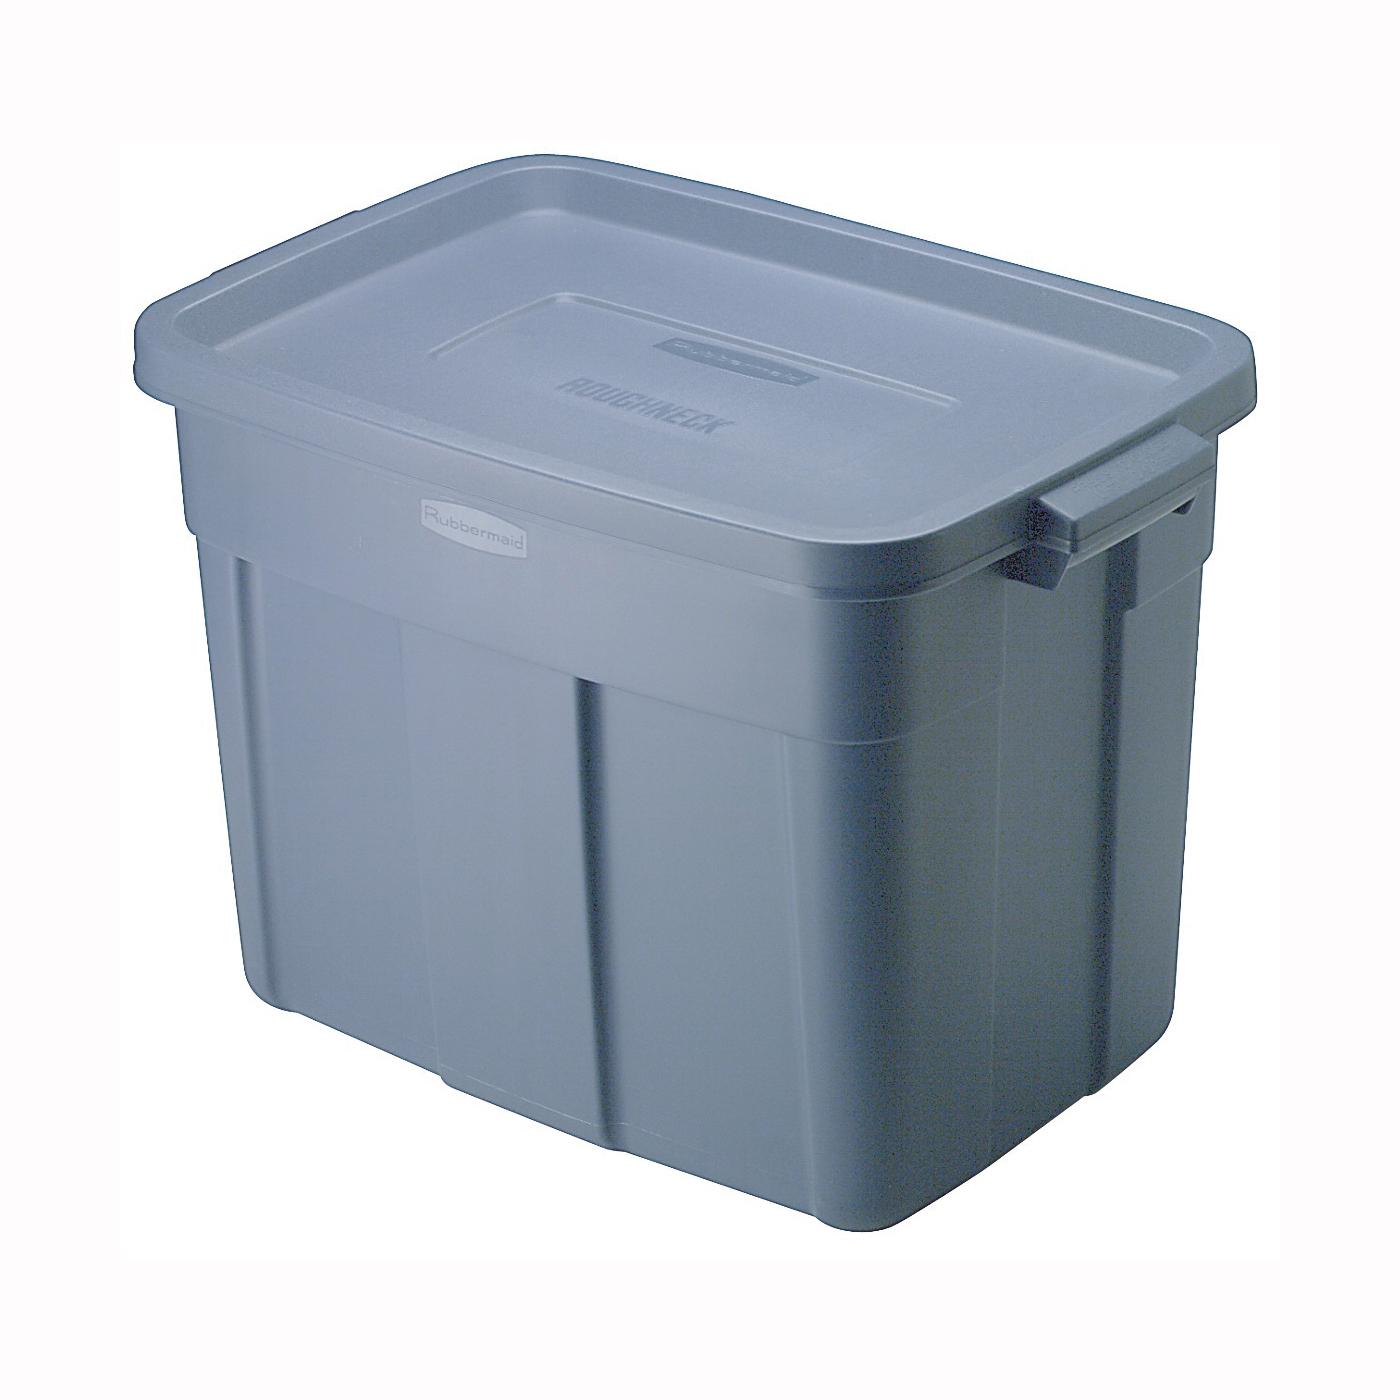 Picture of Rubbermaid Roughneck RMRT180000 Storage Box, Polyethylene, Dark Indigo, 23.9 in L, 15.9 in W, 16-1/2 in H